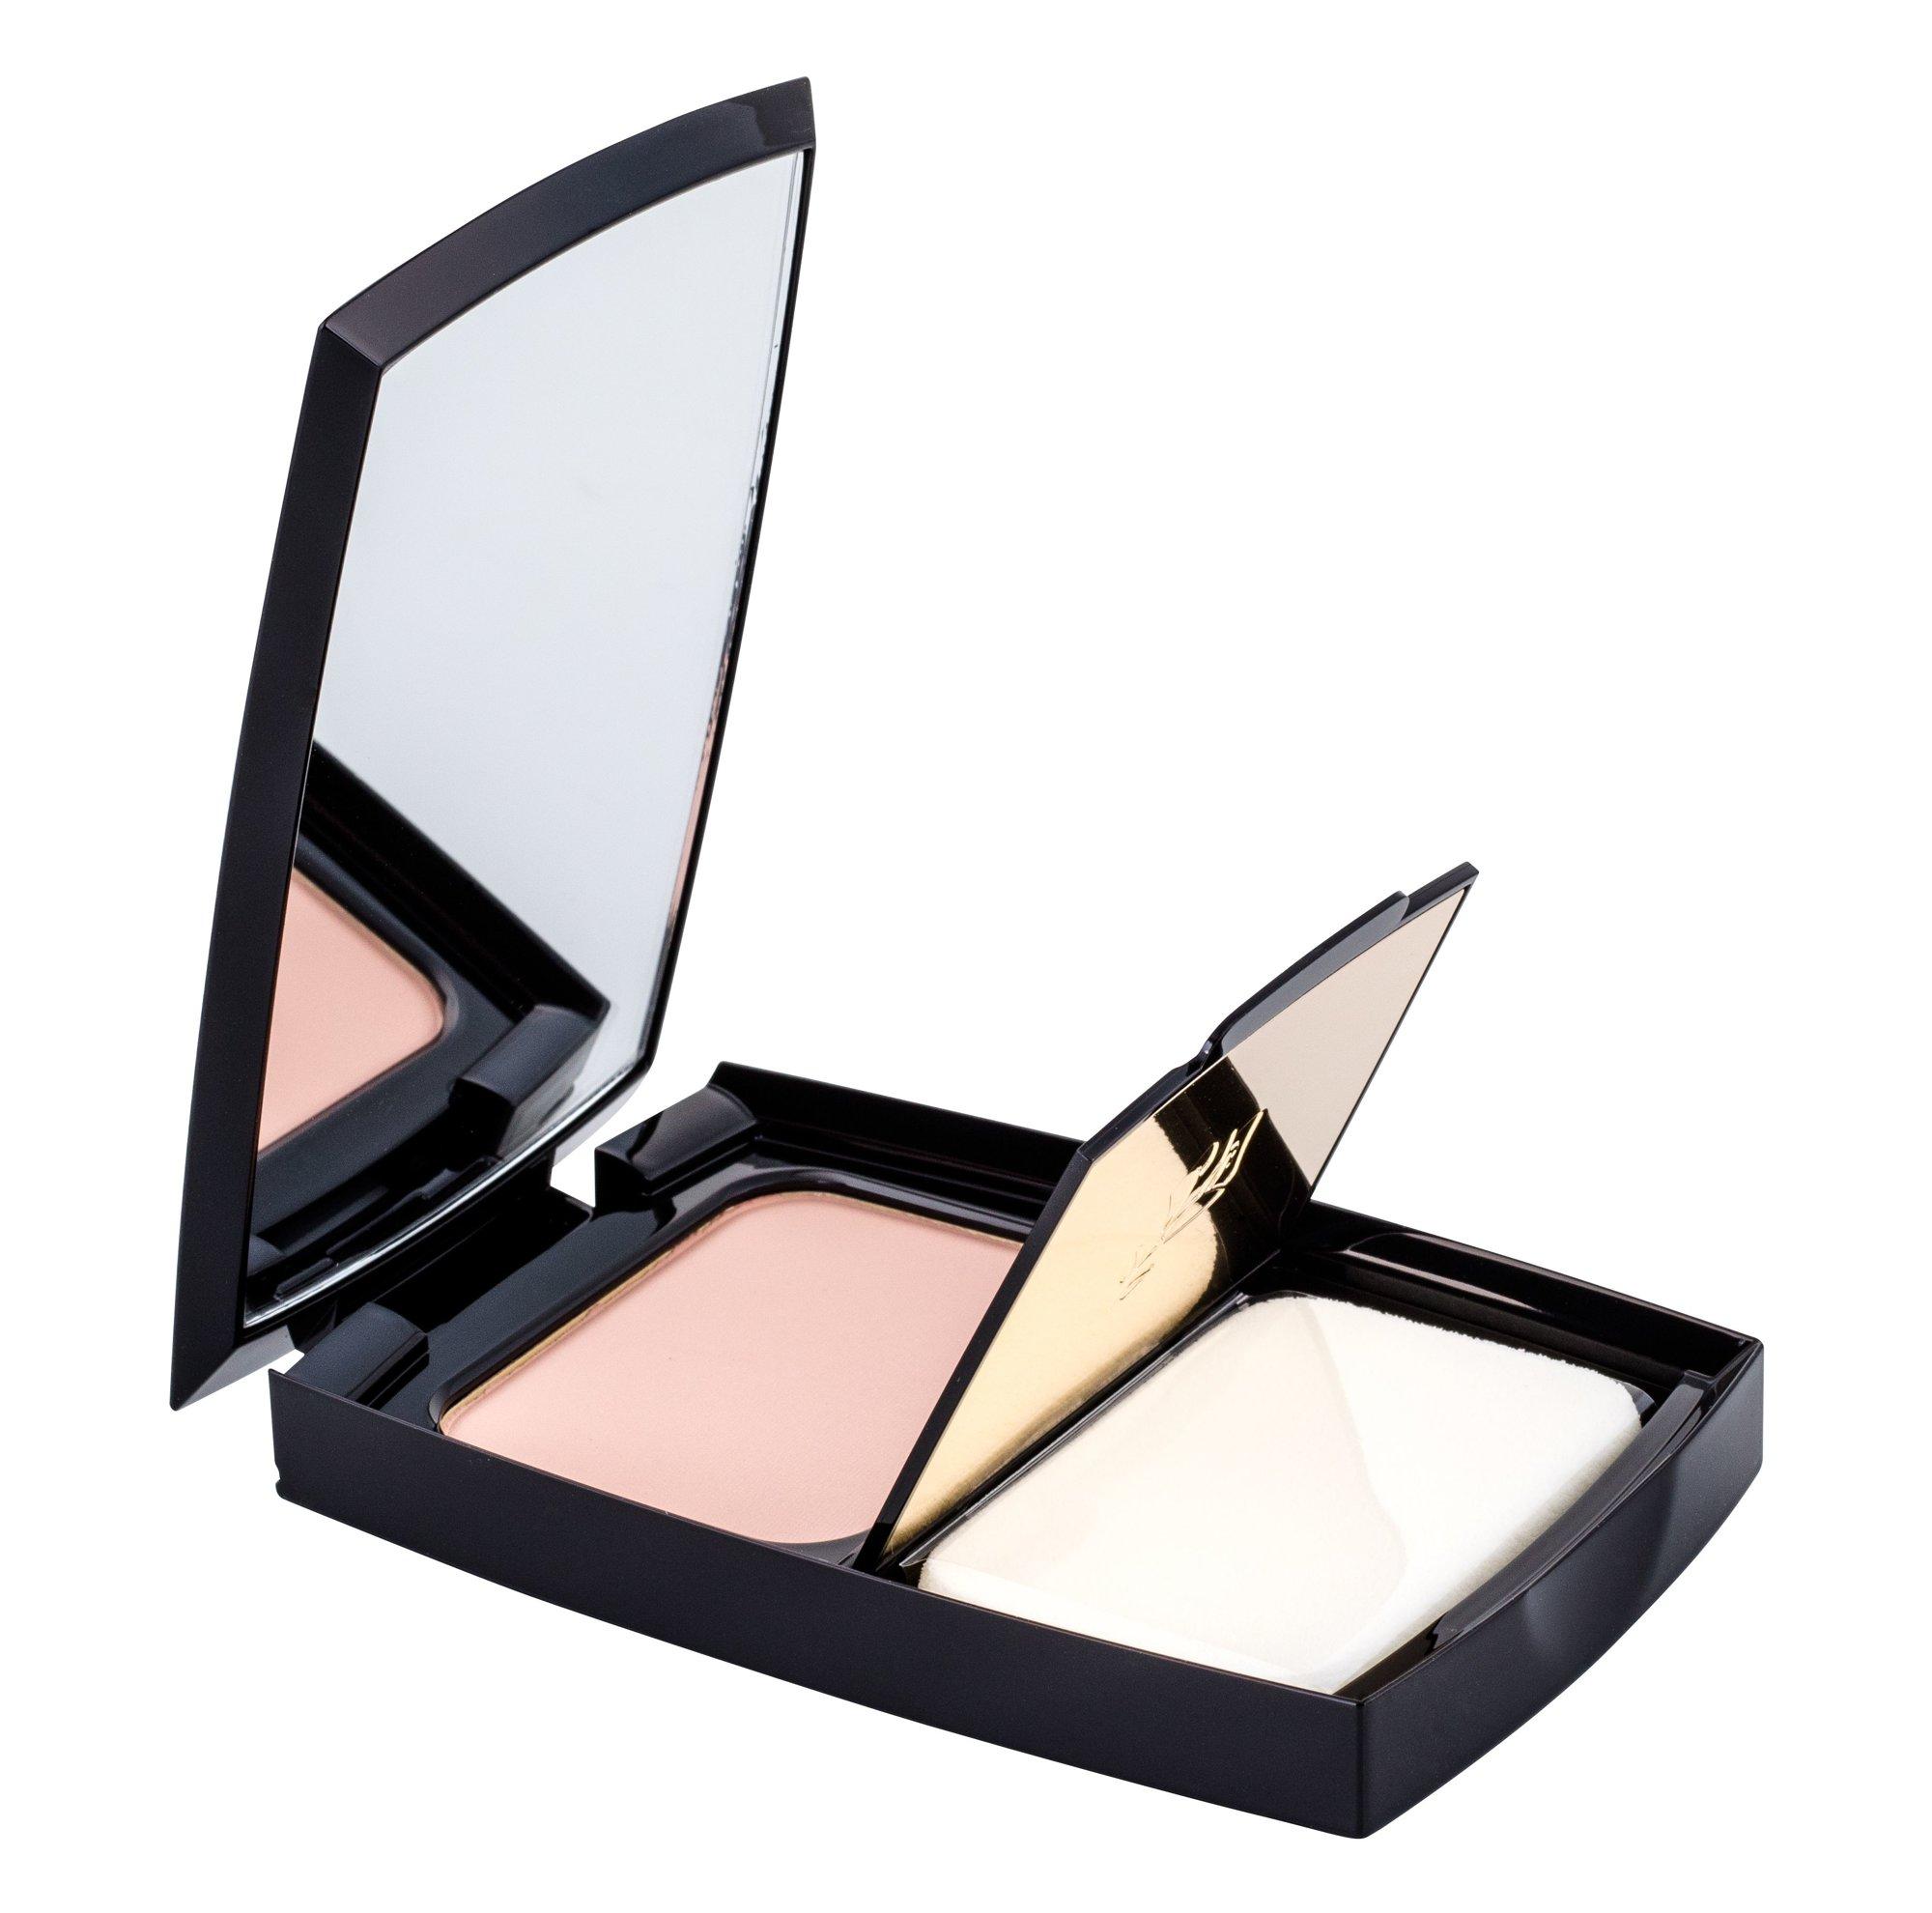 Lancôme Teint Idole Ultra Cosmetic 9ml 02 Lys Rose